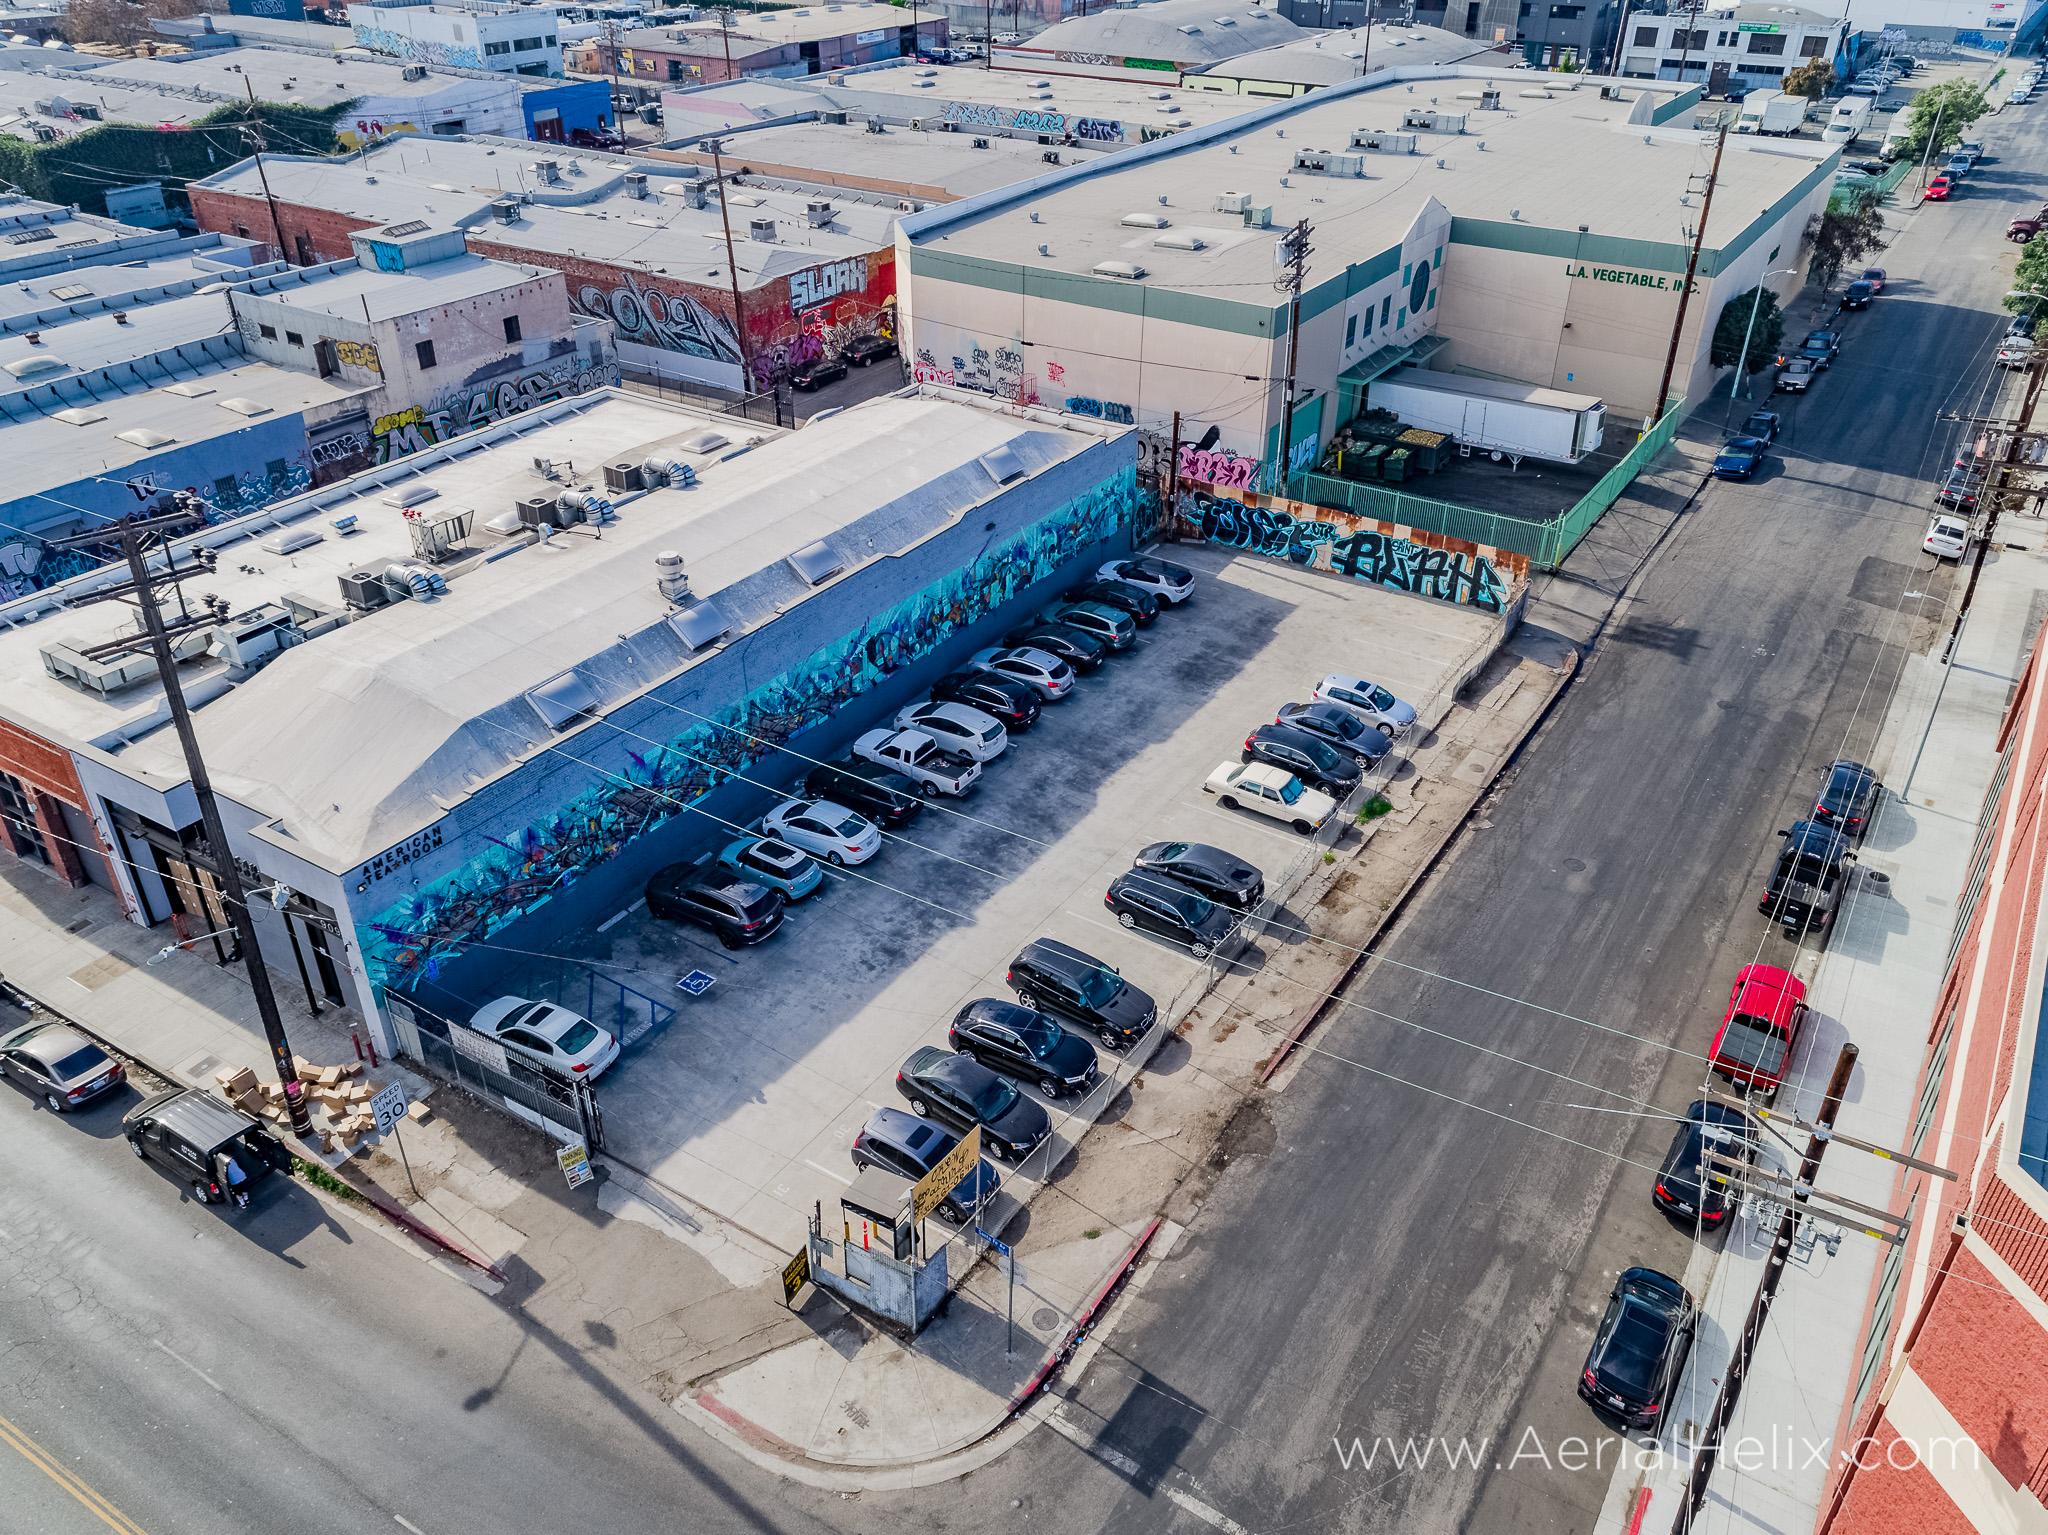 Perfect Parking 2 aerial photographer-30.jpg